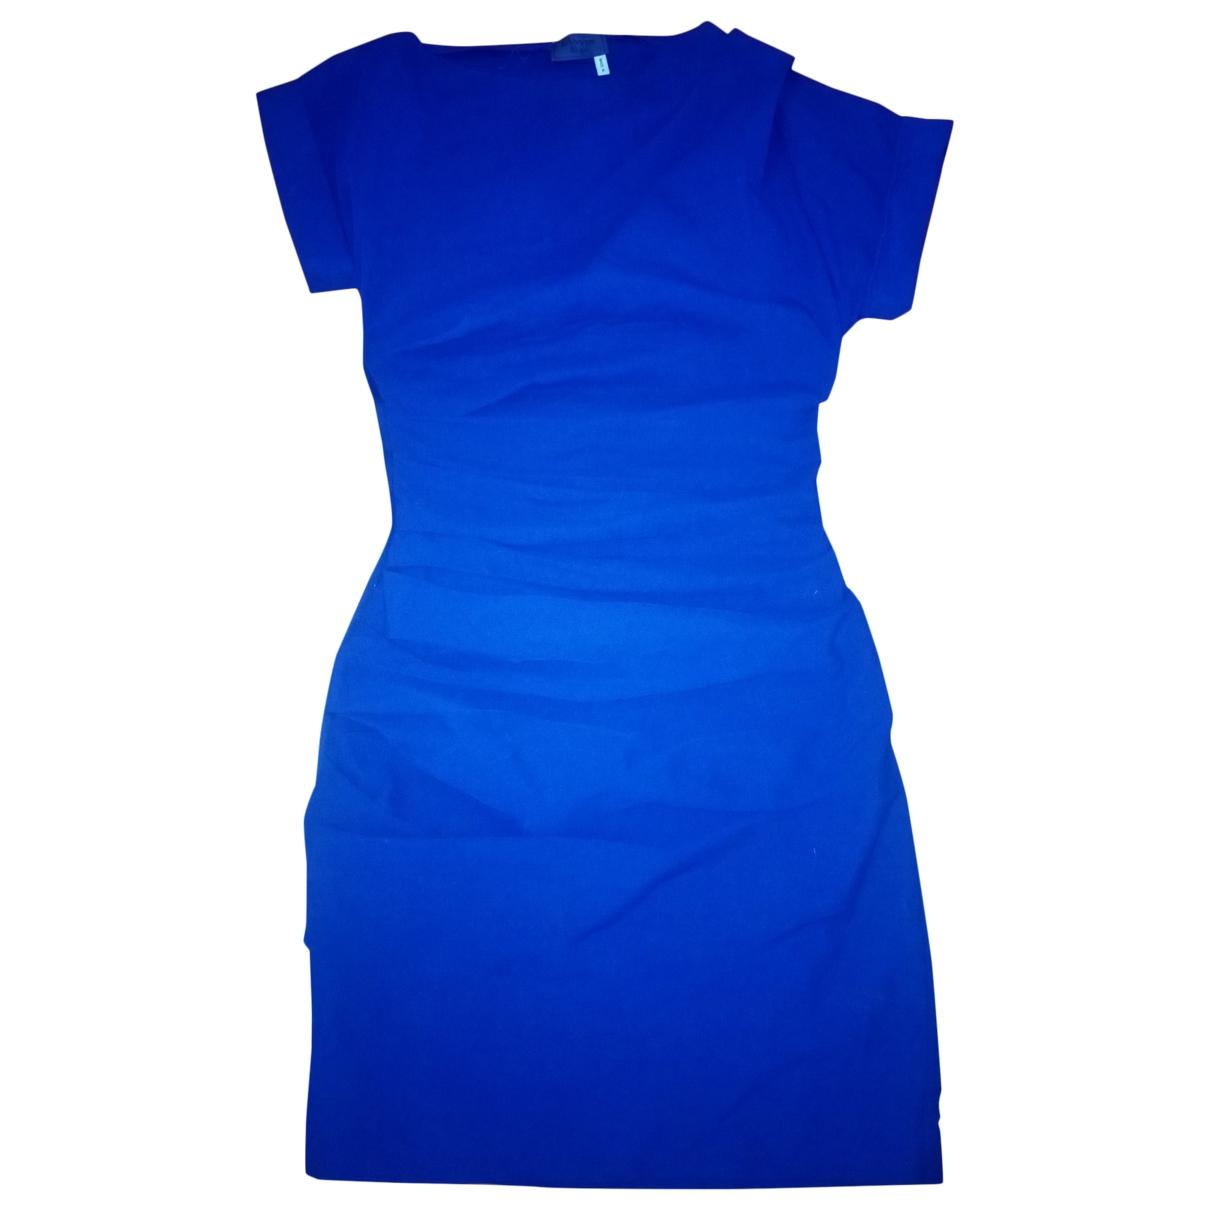 Lanvin \N Blue Linen dress for Women 36 FR